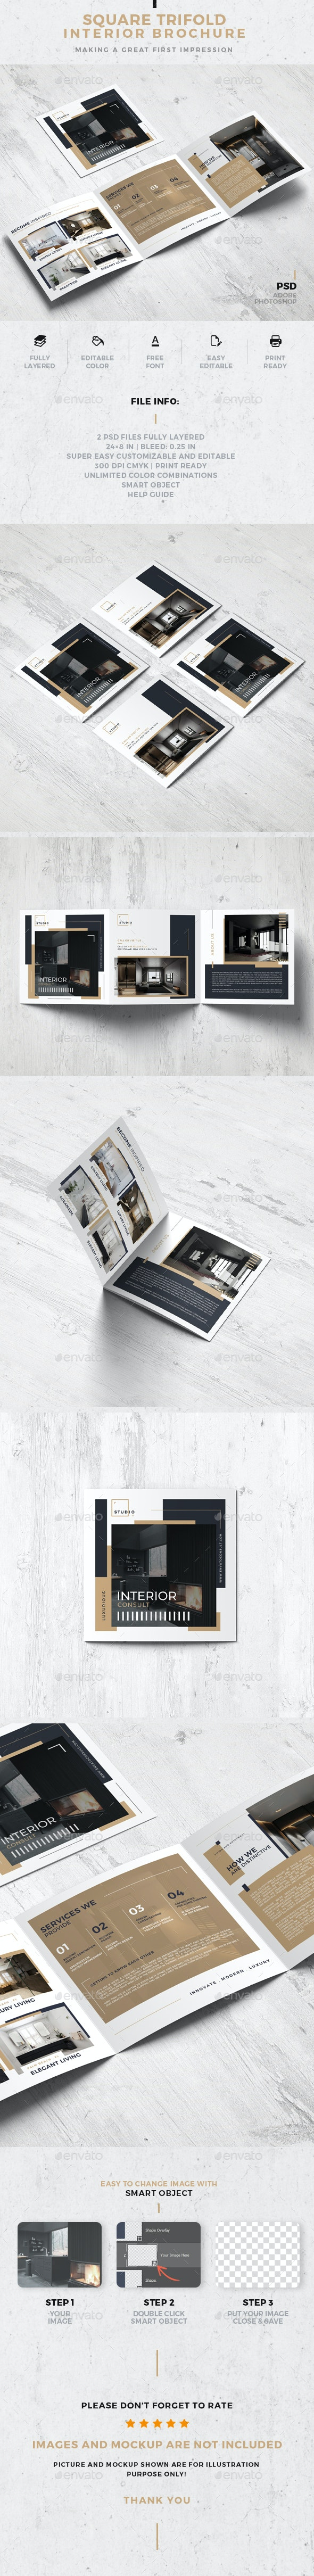 Square Trifold Interior Design Brochure - Corporate Brochures